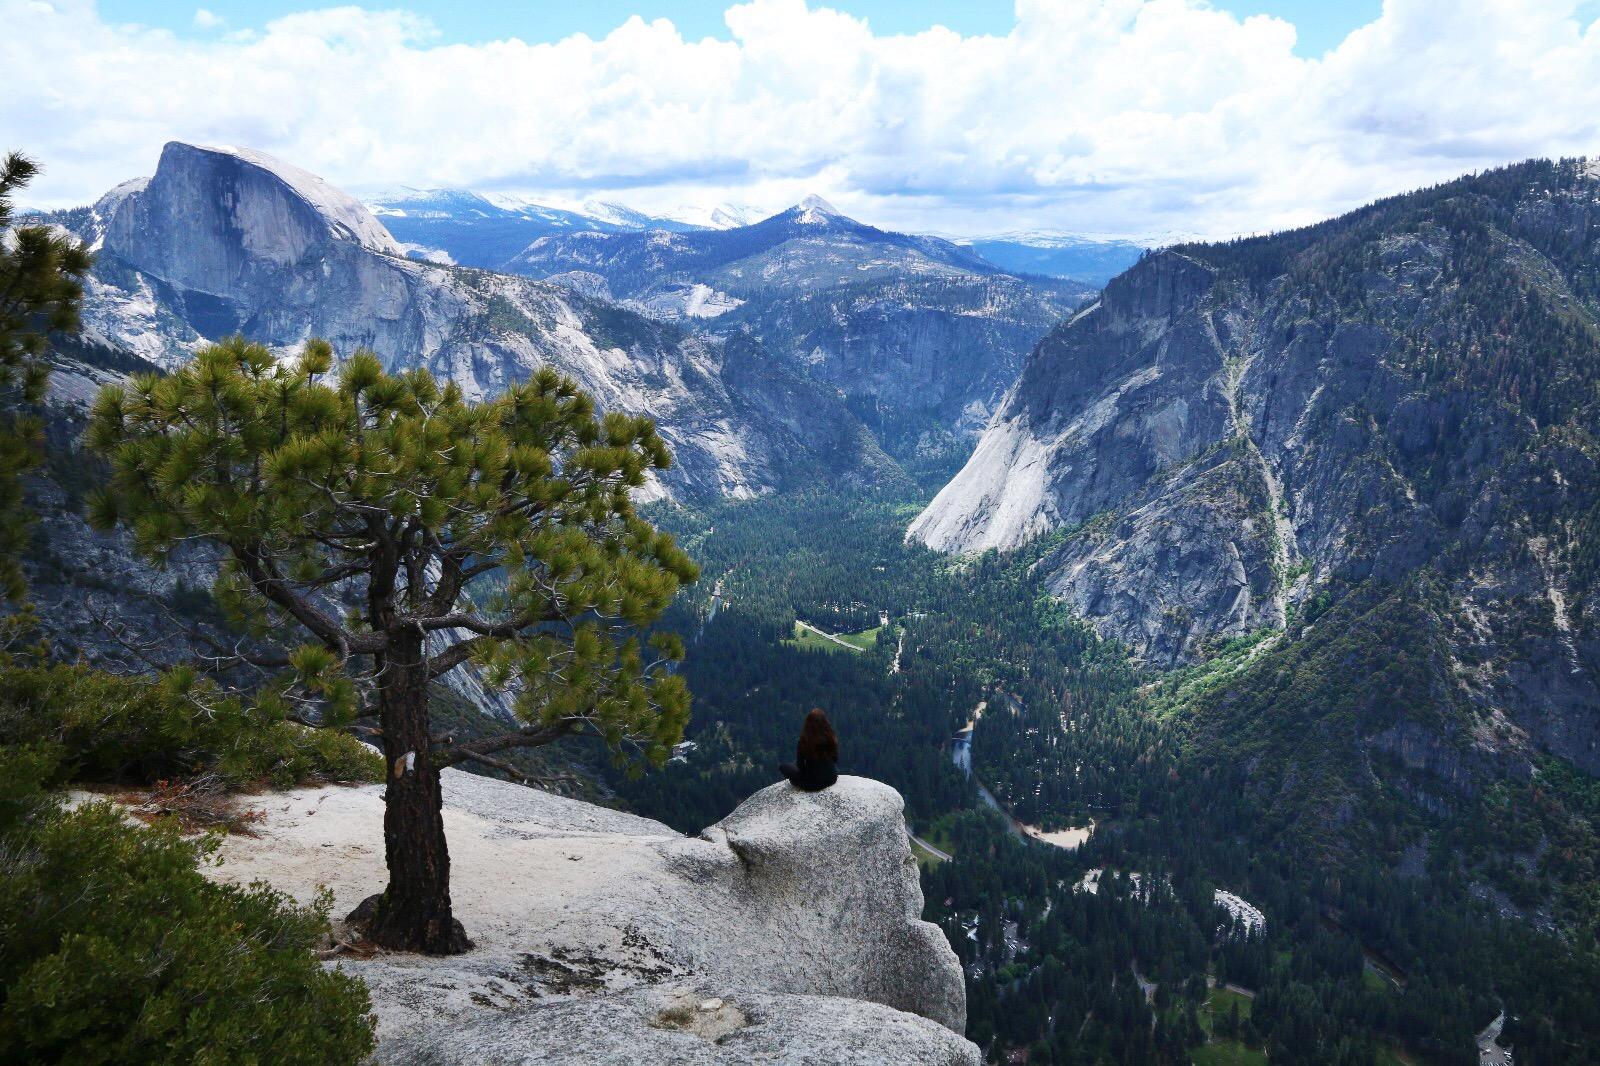 yosemite-national-park-hike